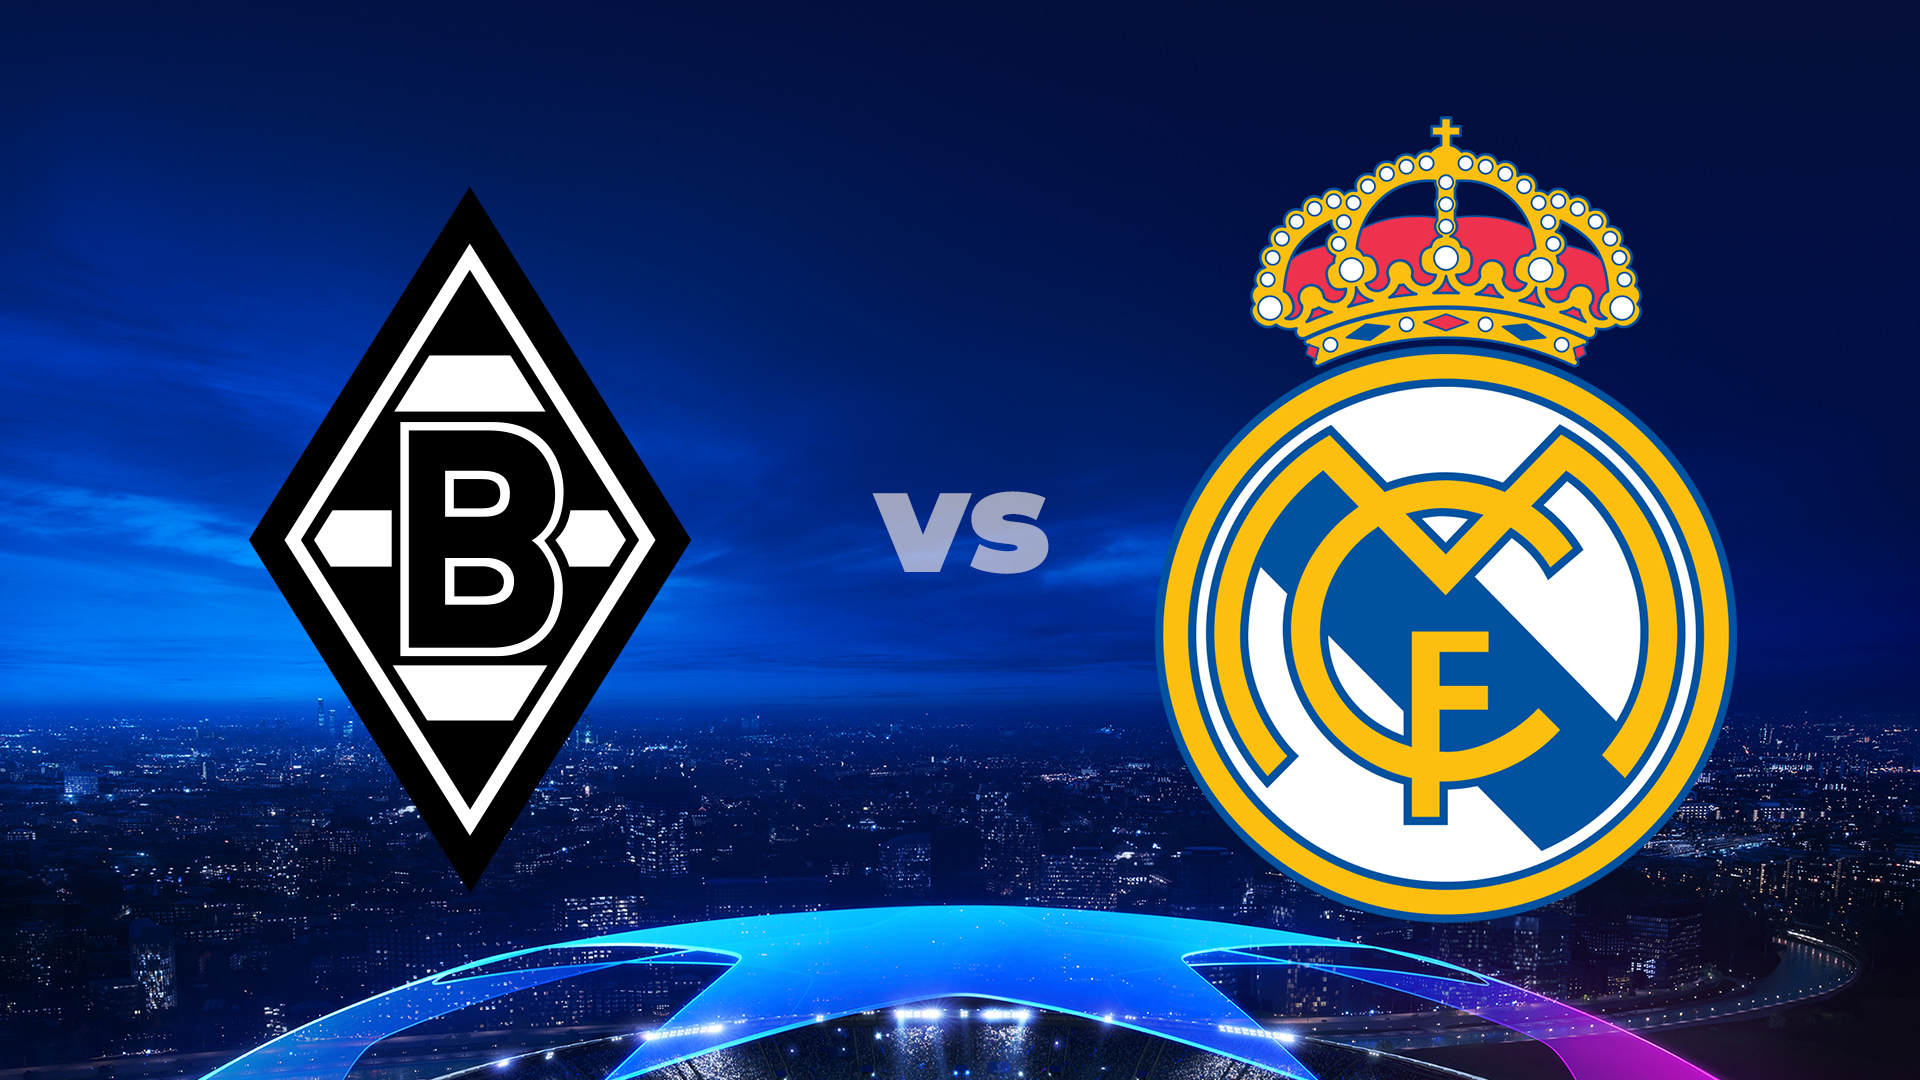 Borussia M'gladbach - Real Madryt